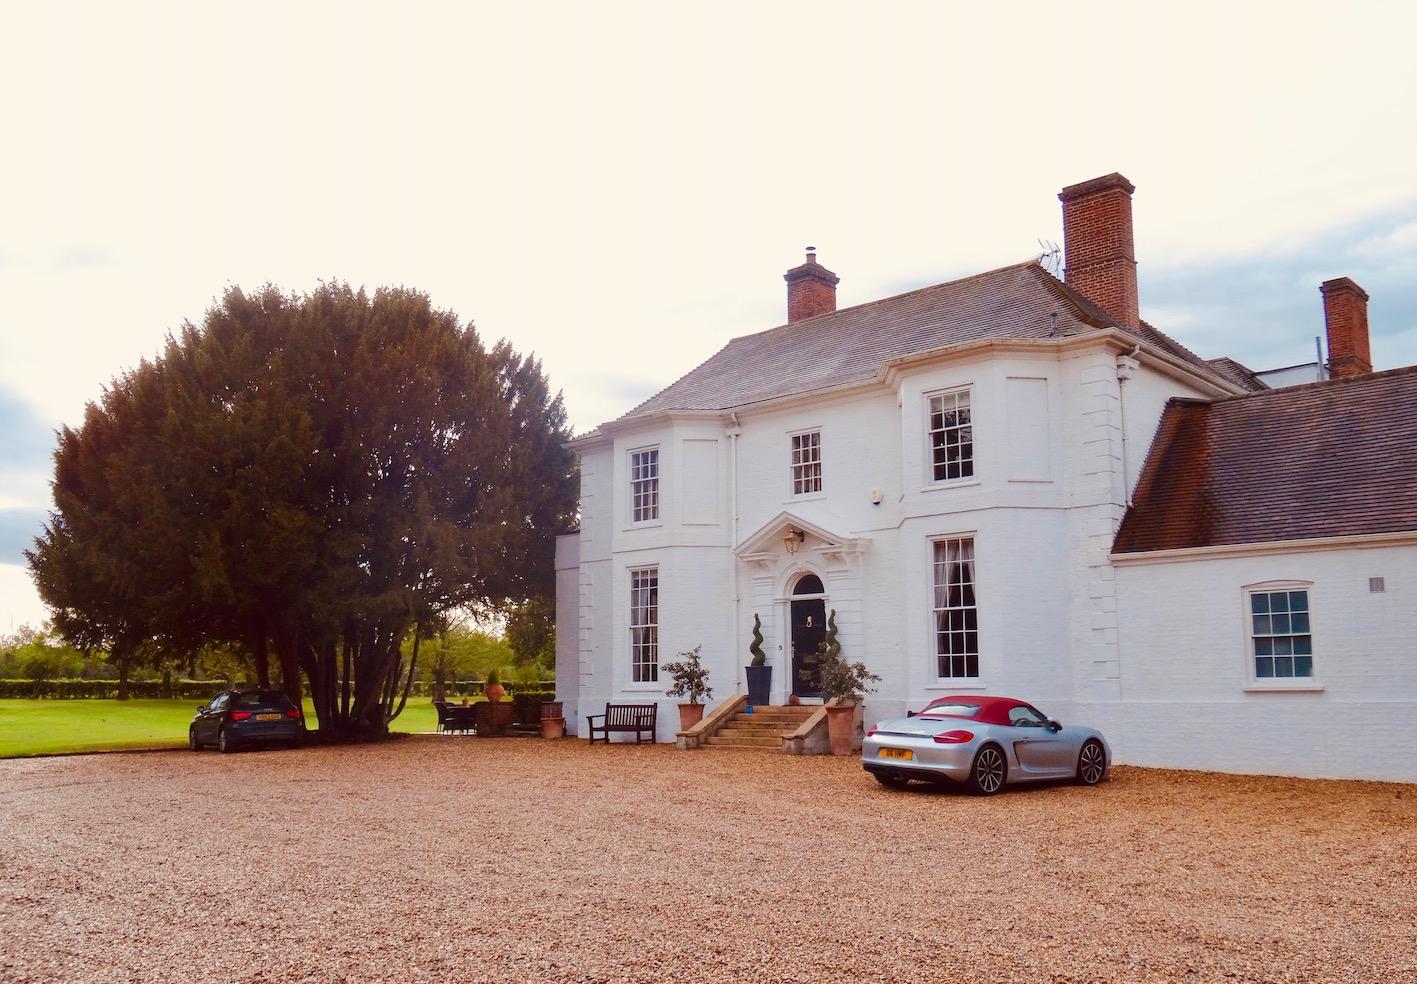 Barrington Hall Country House Cambridgeshire England.